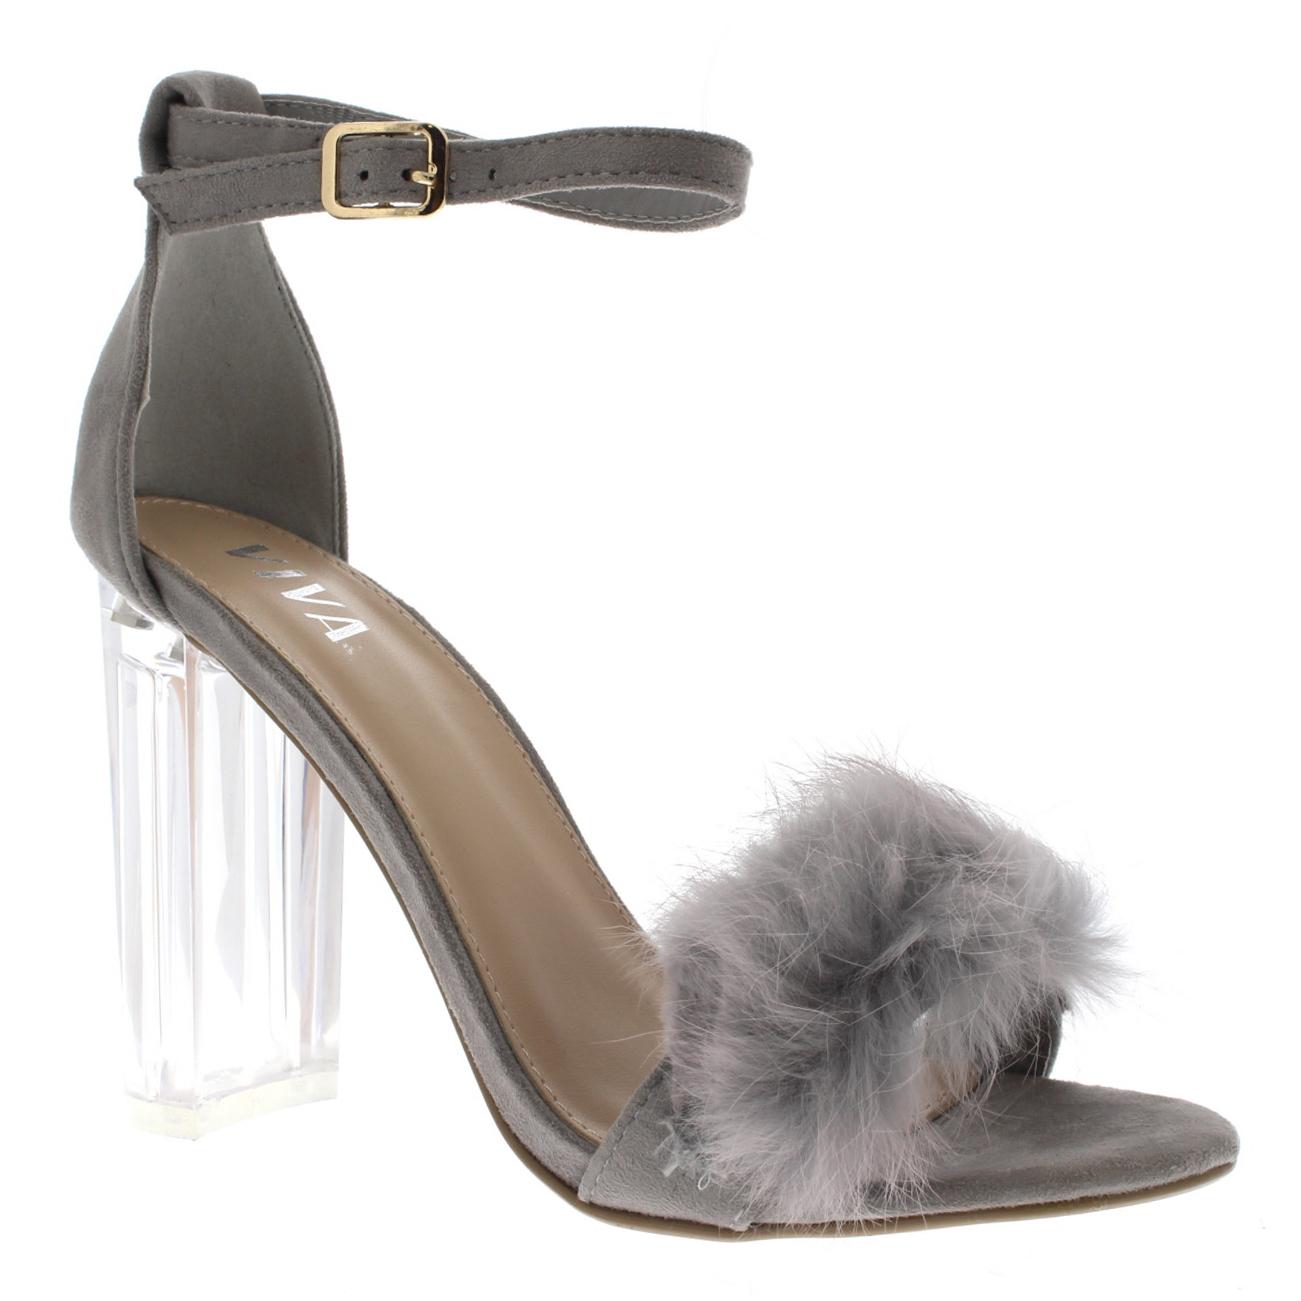 d5156aeb2ab Womens Fluffy Glass Block Heel Party Cut Out Fashion High Heels ...